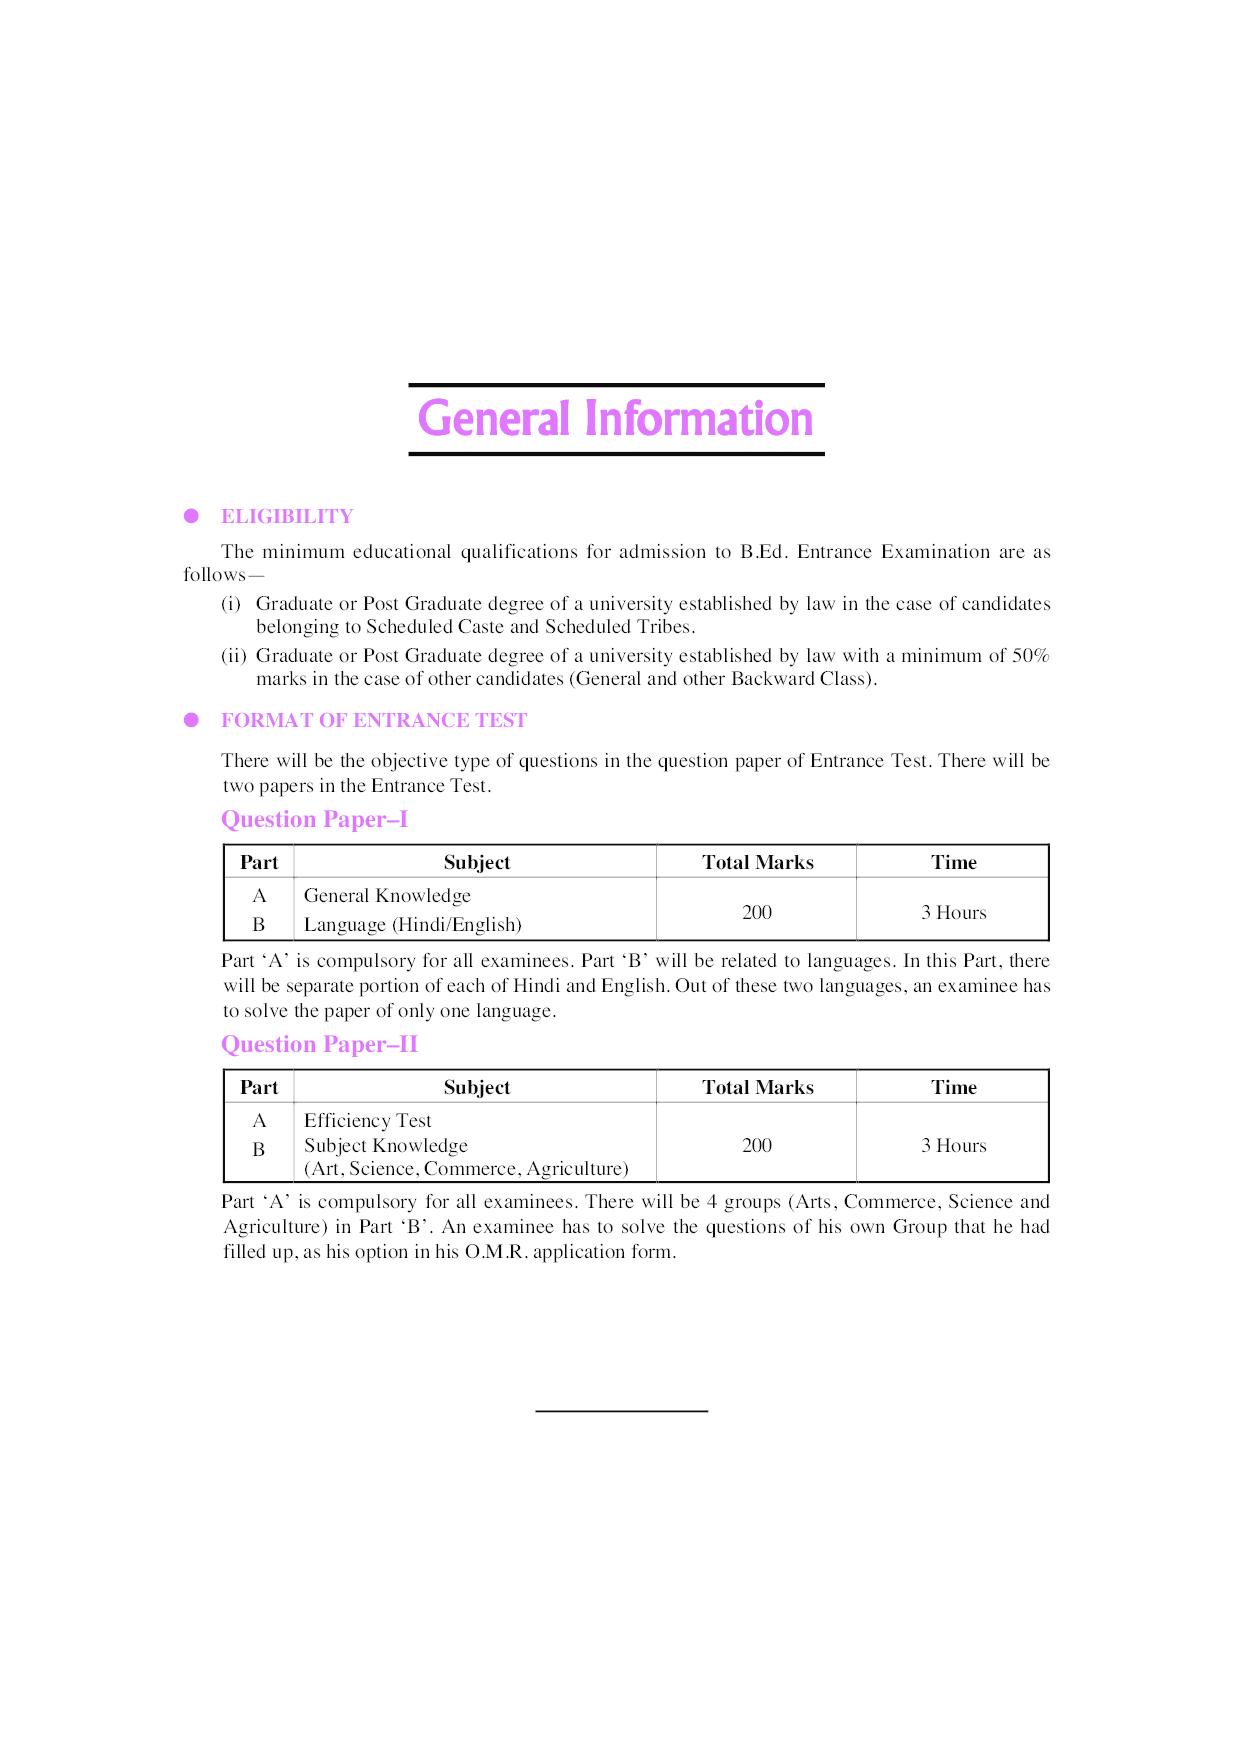 Uttar Pradesh B.Ed. Joint Entrance Test (Arts Group) - Page 5